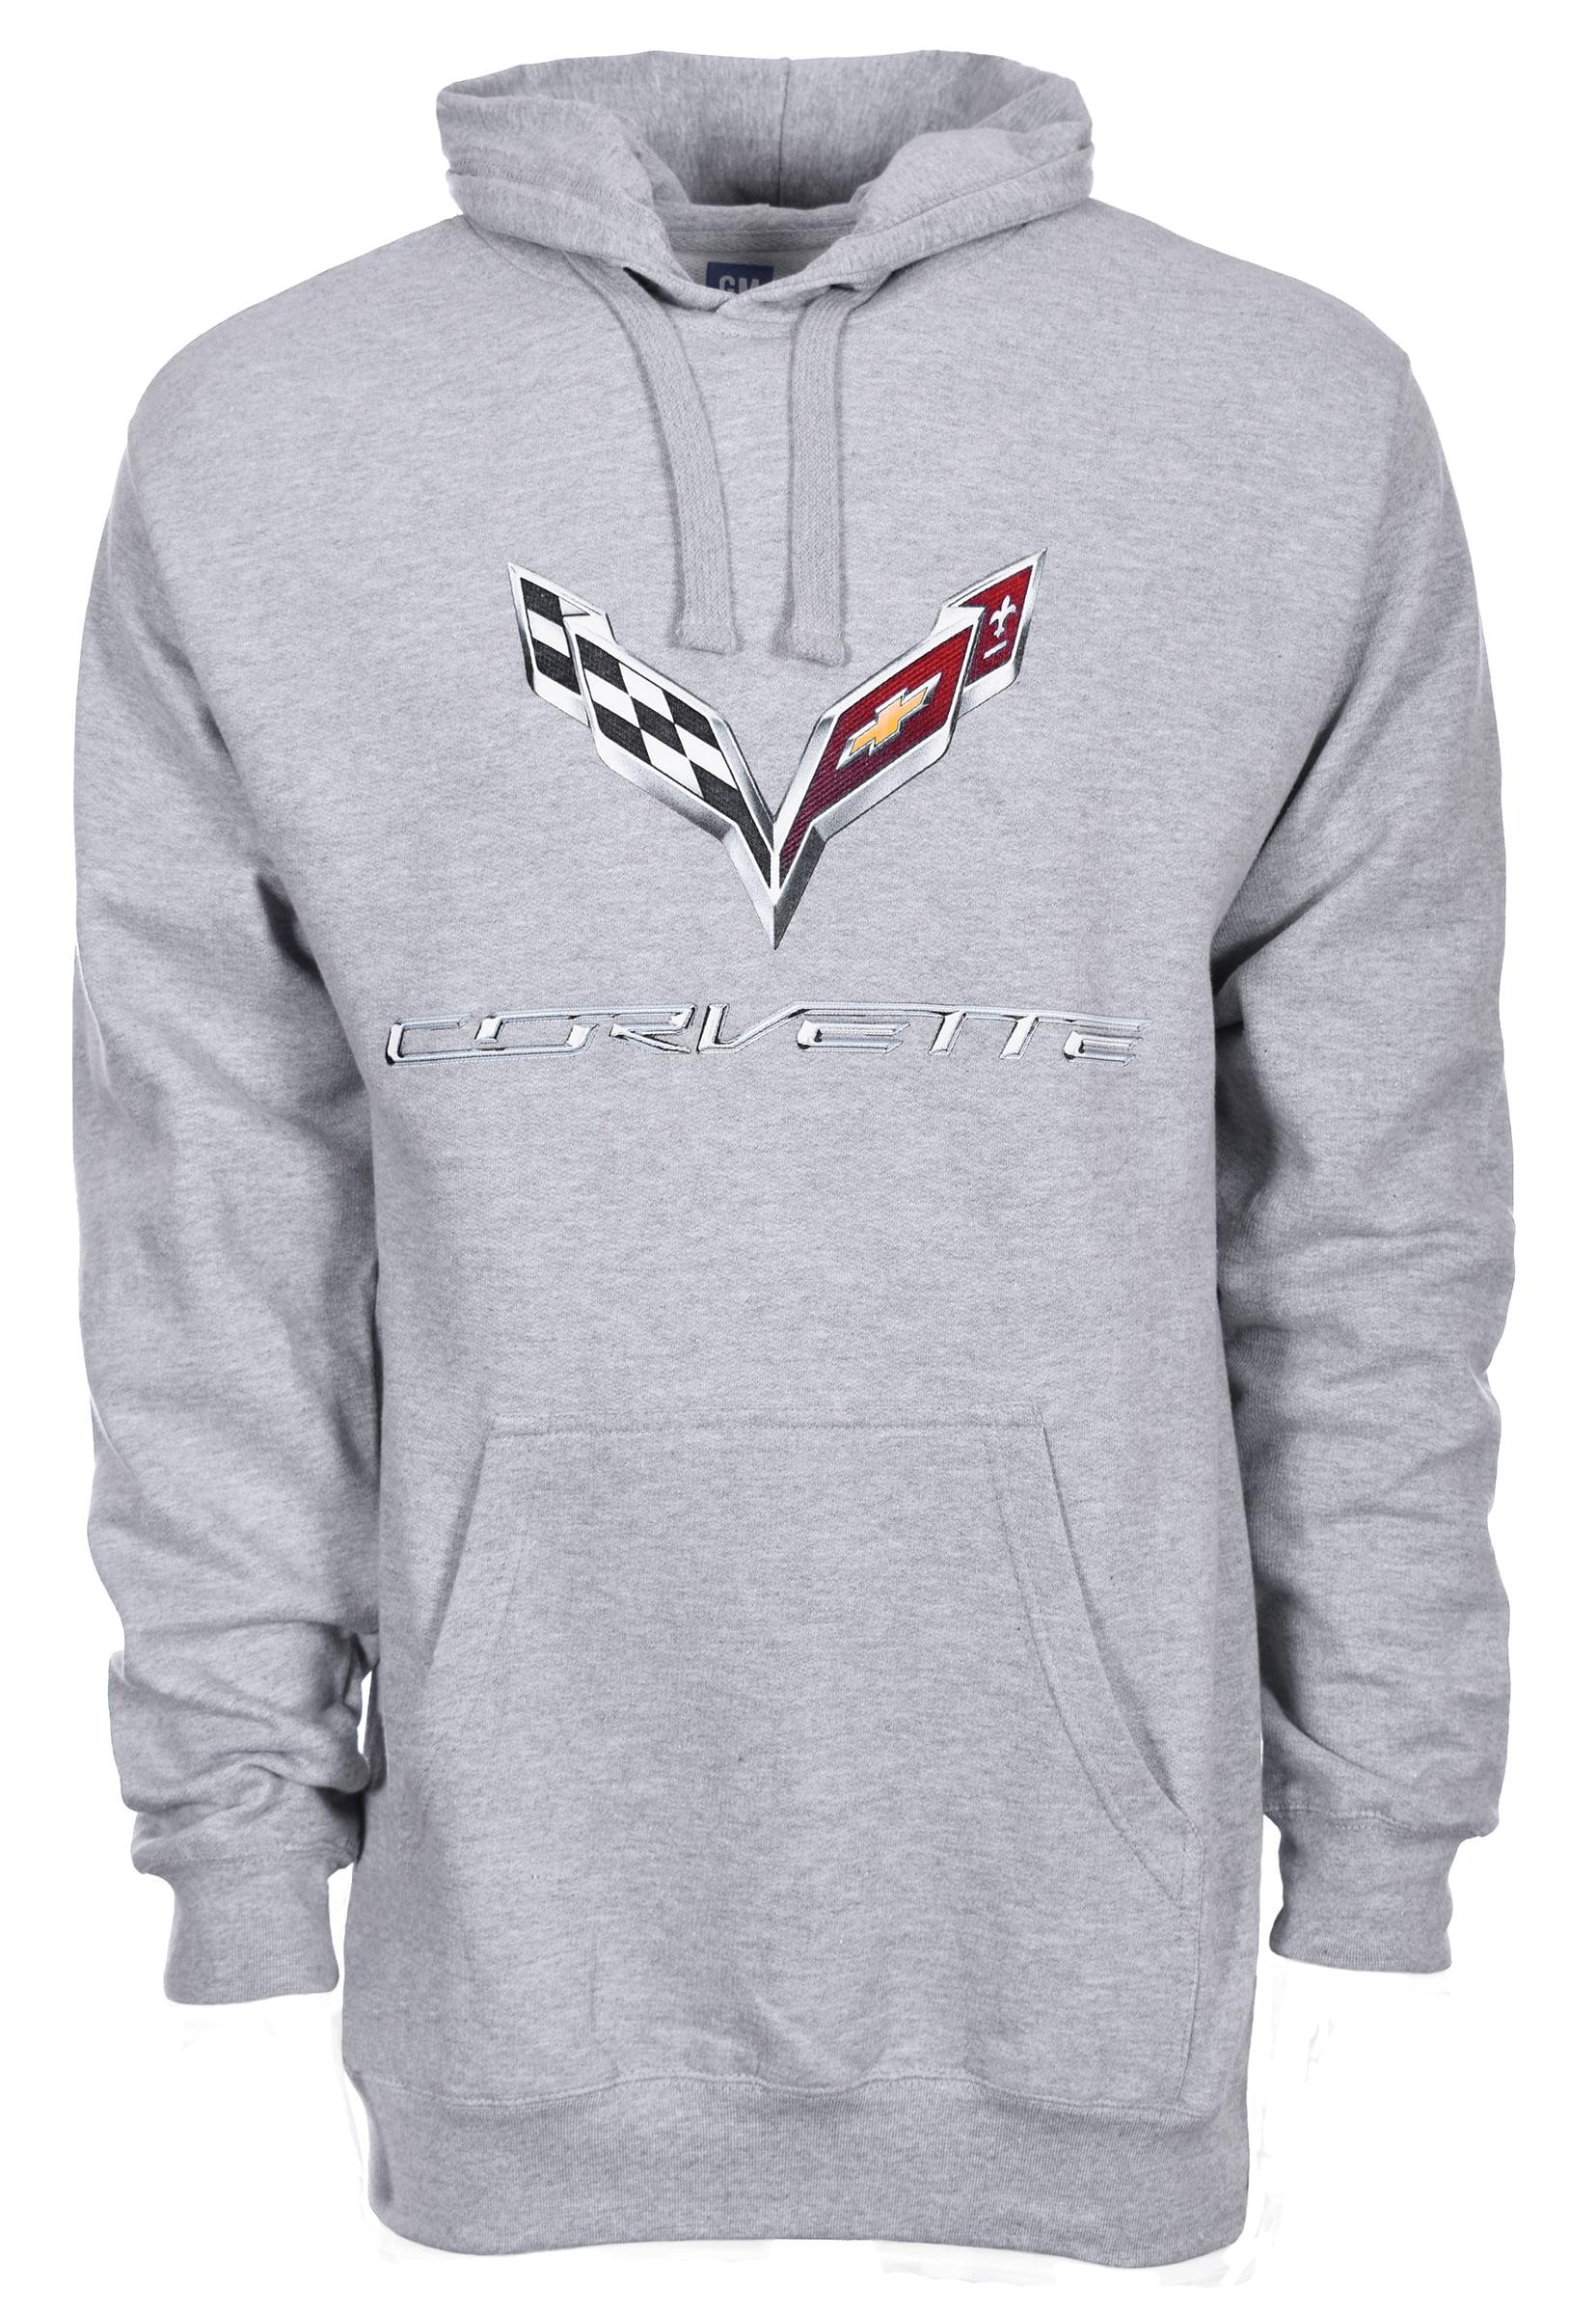 JH DESIGN GROUP Mens Chevy Corvette Hoodies